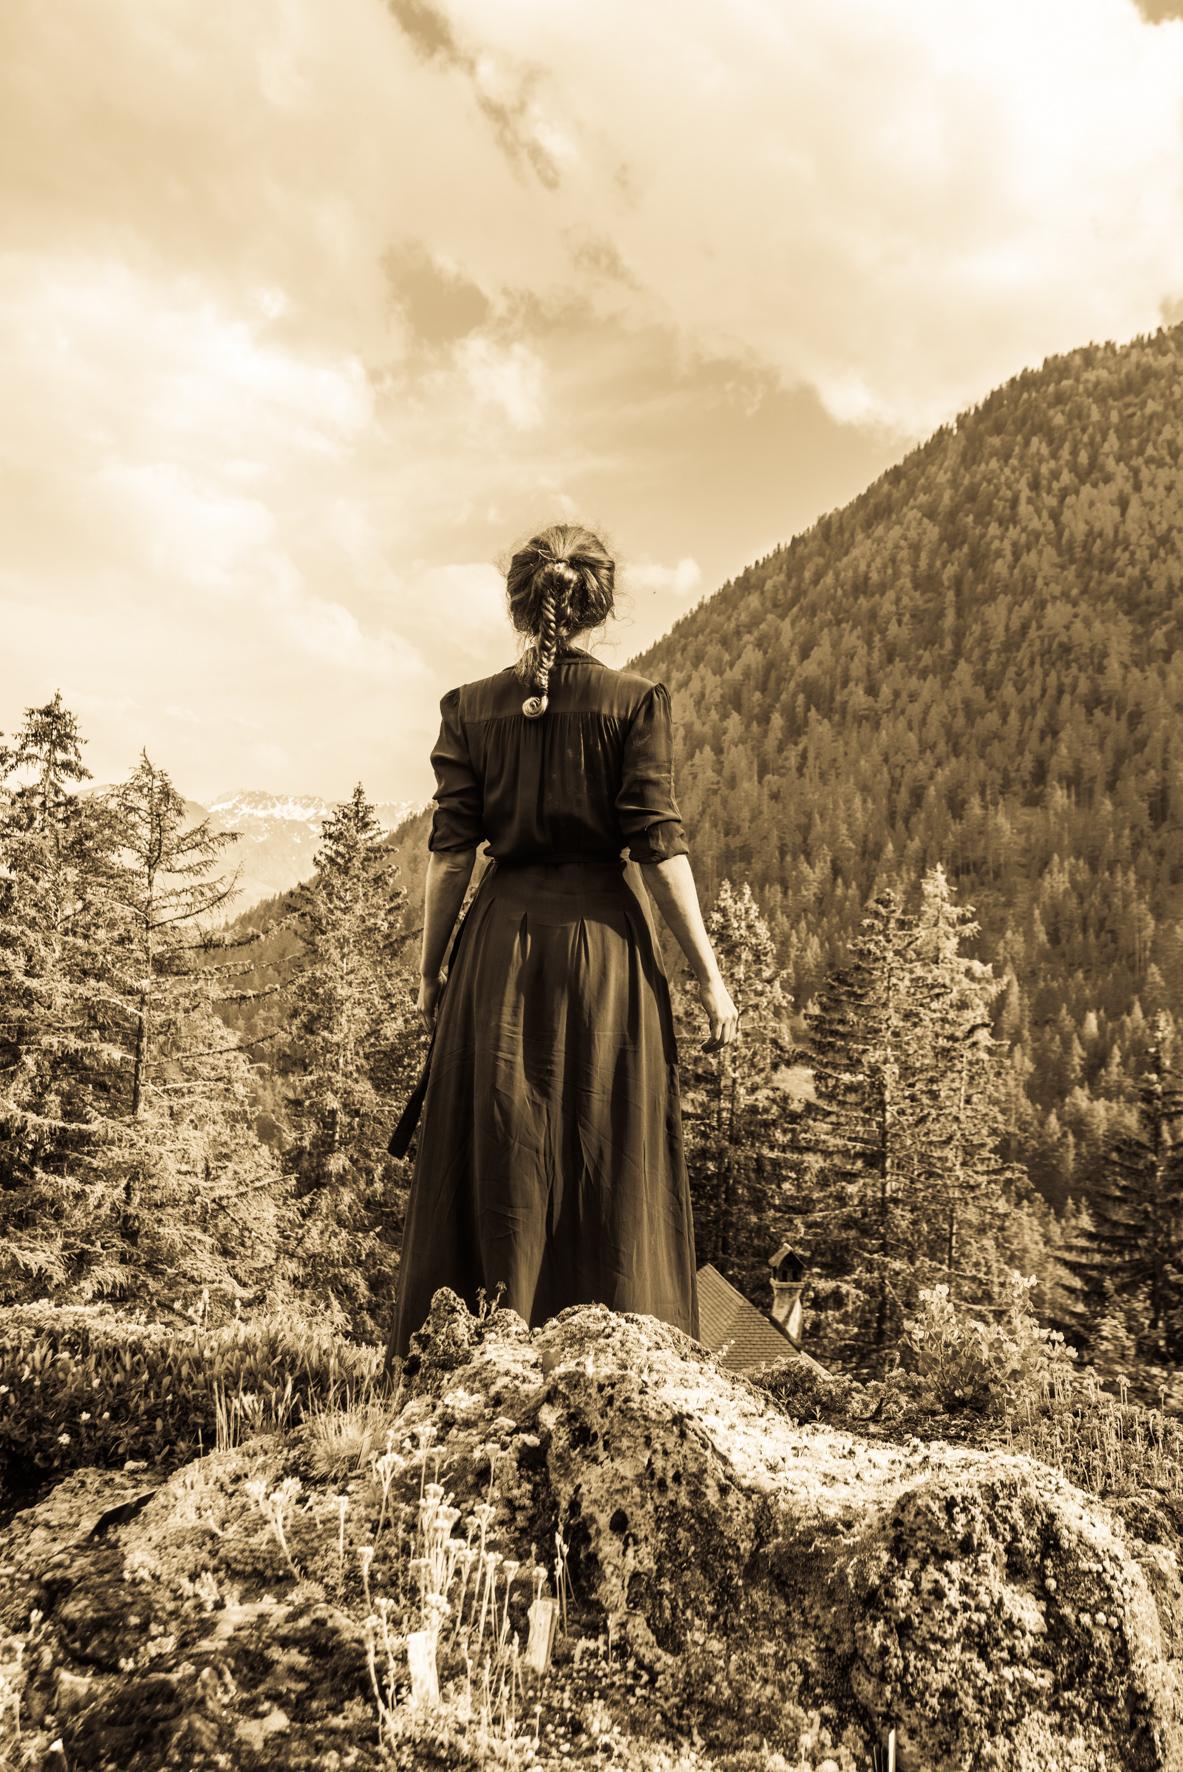 19062021-Flore-Alpe-30279